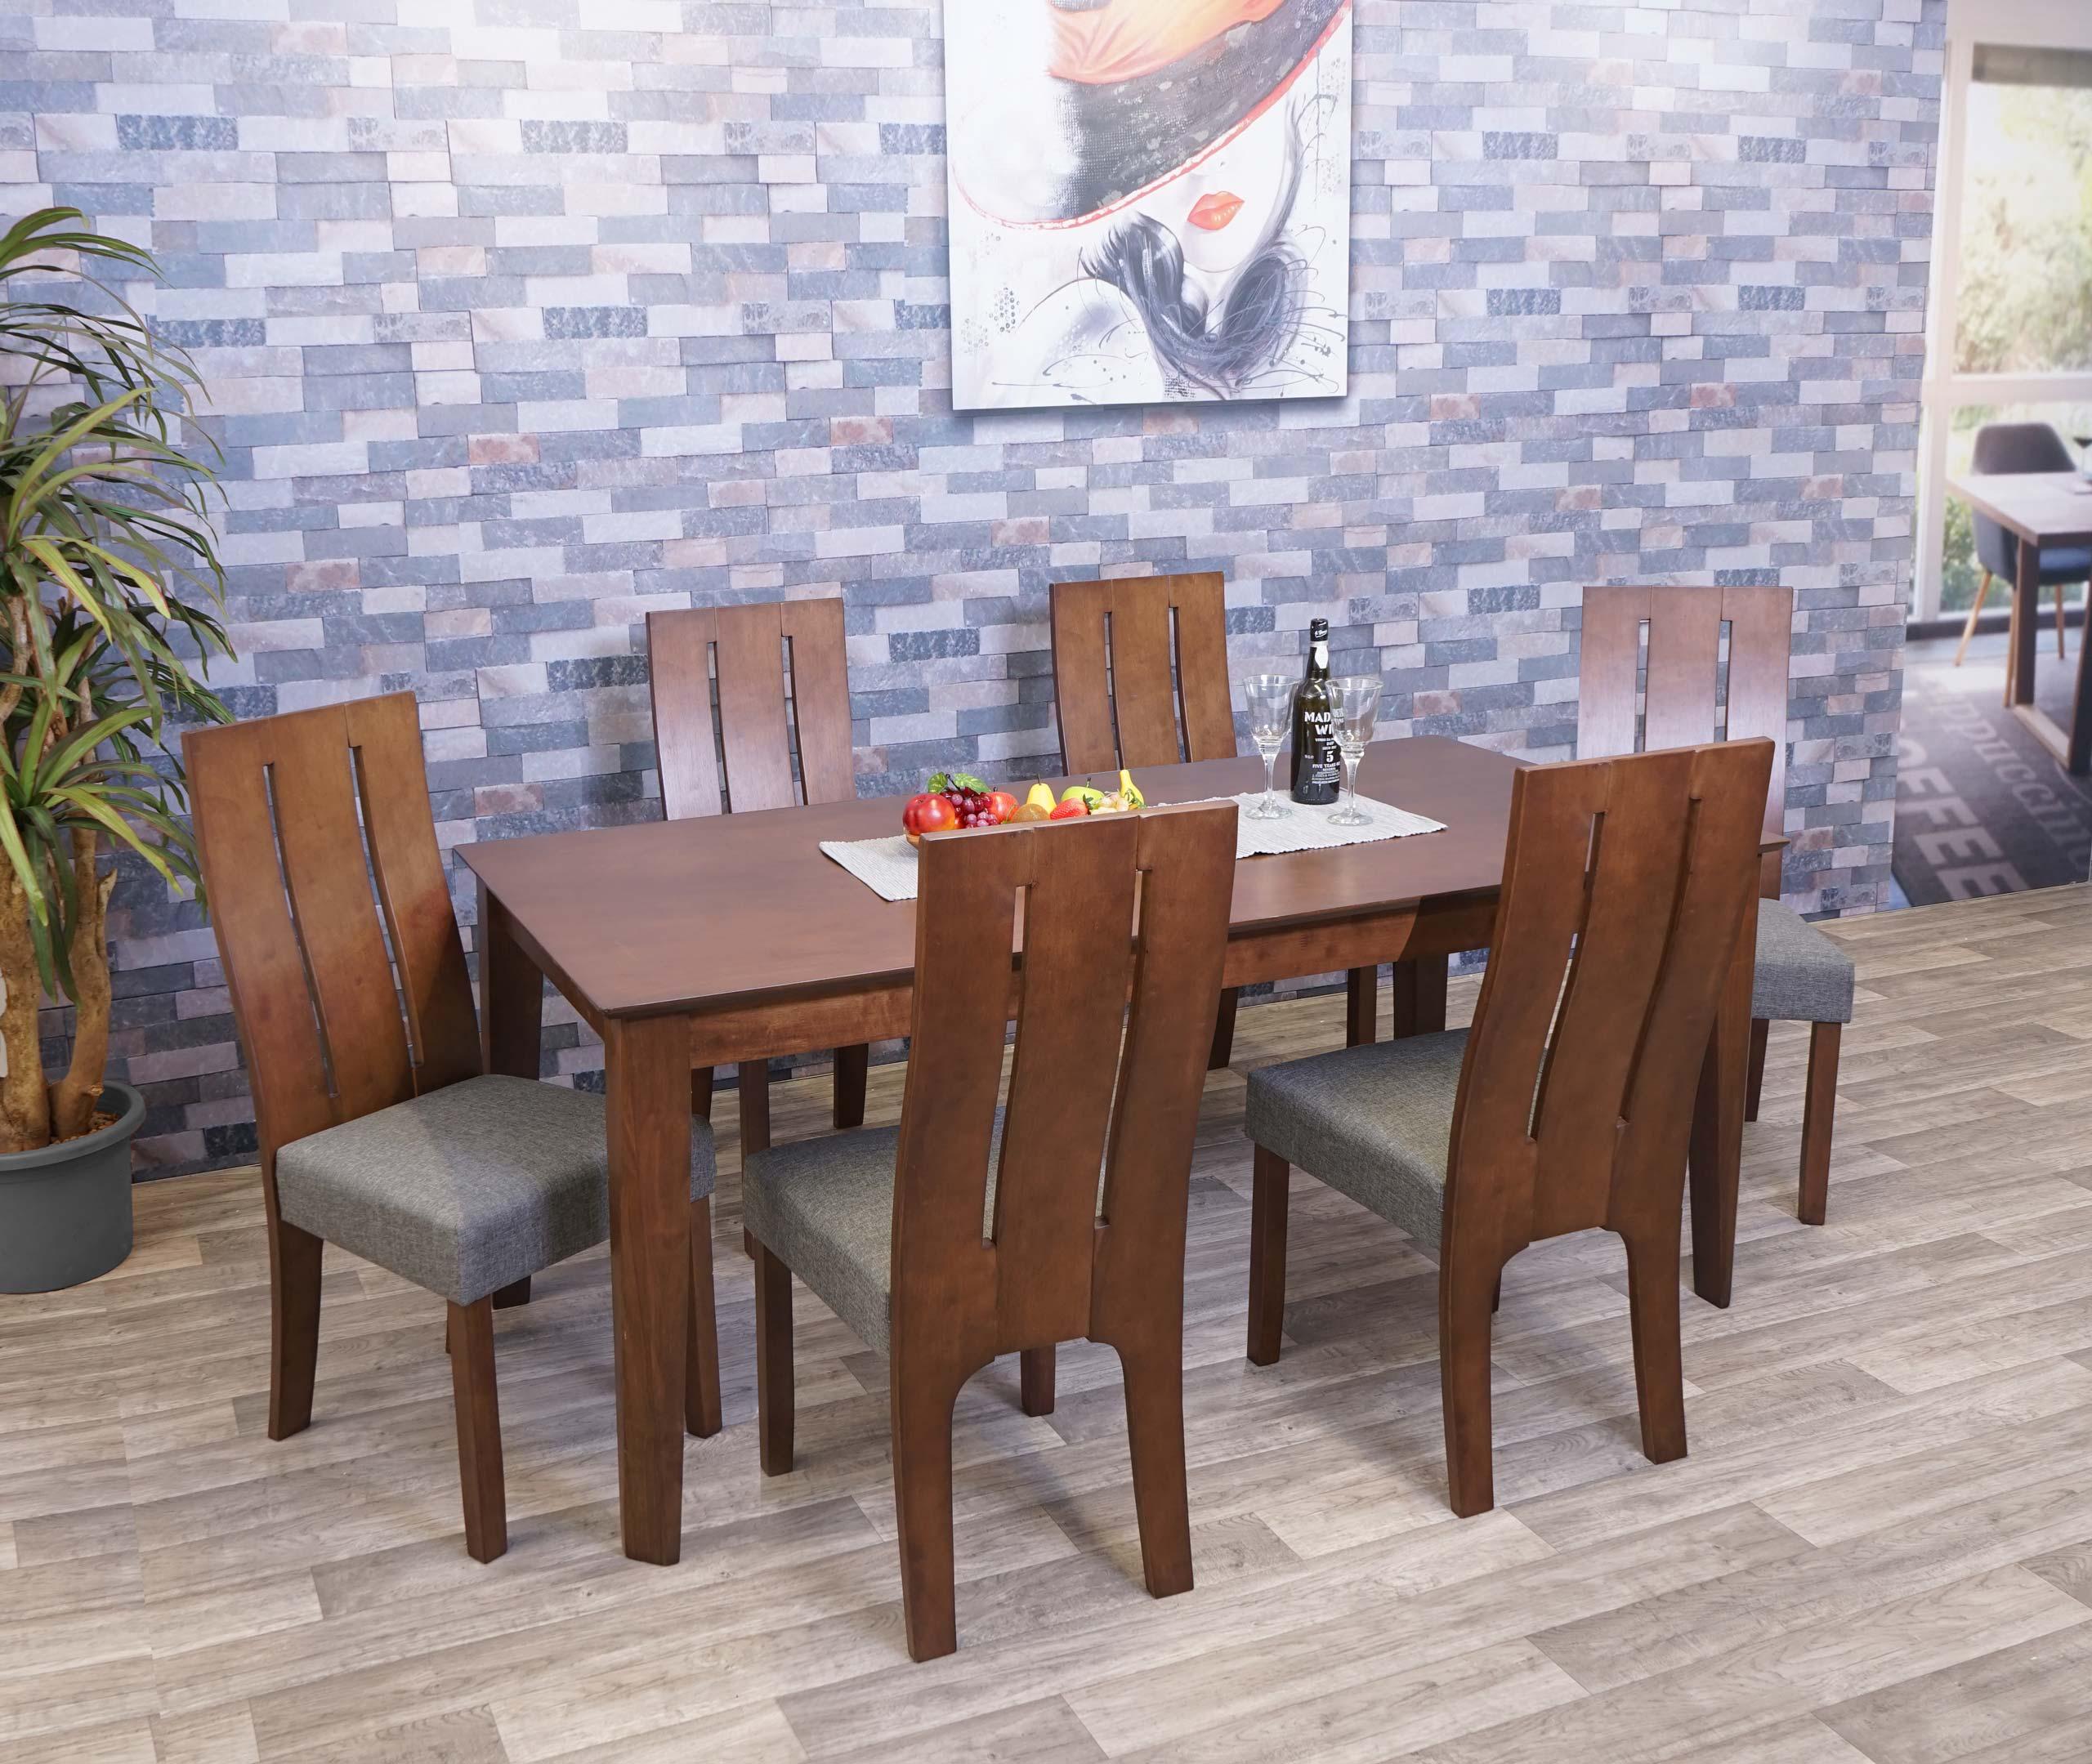 Mendler Esszimmer-Set HWC-G63, Sitzgruppe Esszimmergruppe Esszimmergarnitur, Stoff/Textil Massiv-Holz ~ Vari 3x71813+71815